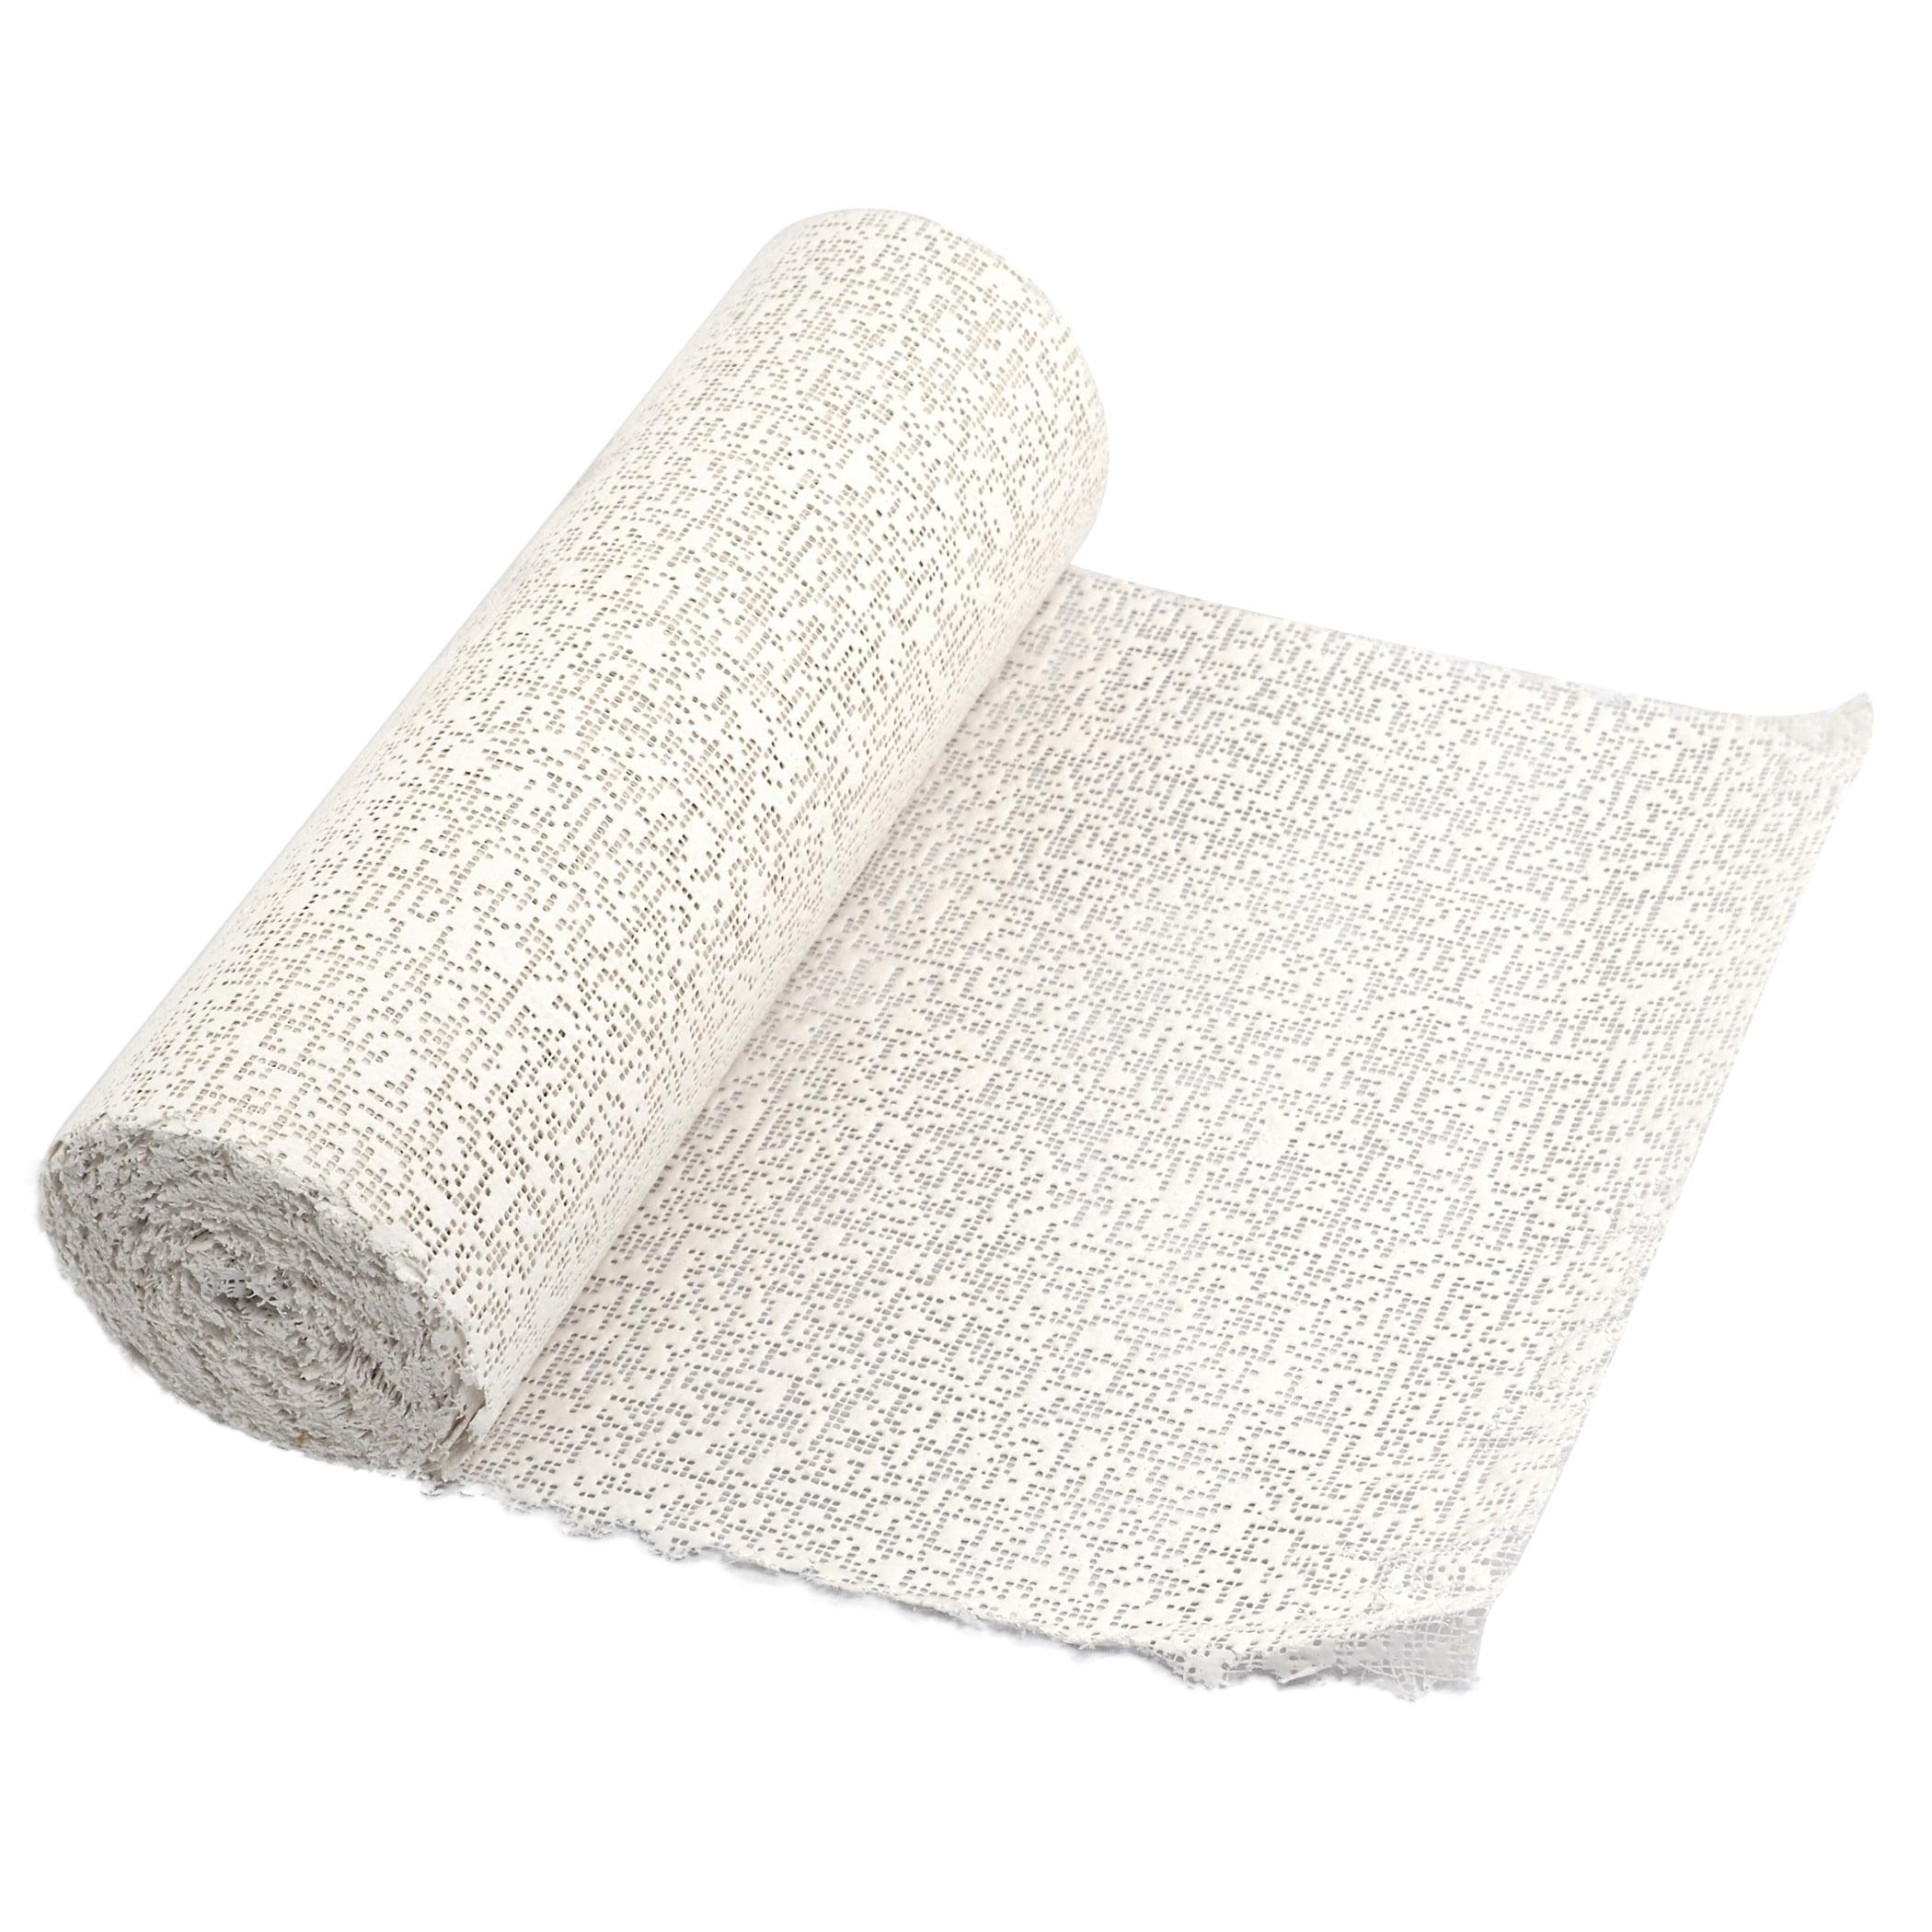 "Sandtastik® Rappit Plaster Cloth, 12"" x 60' Roll"